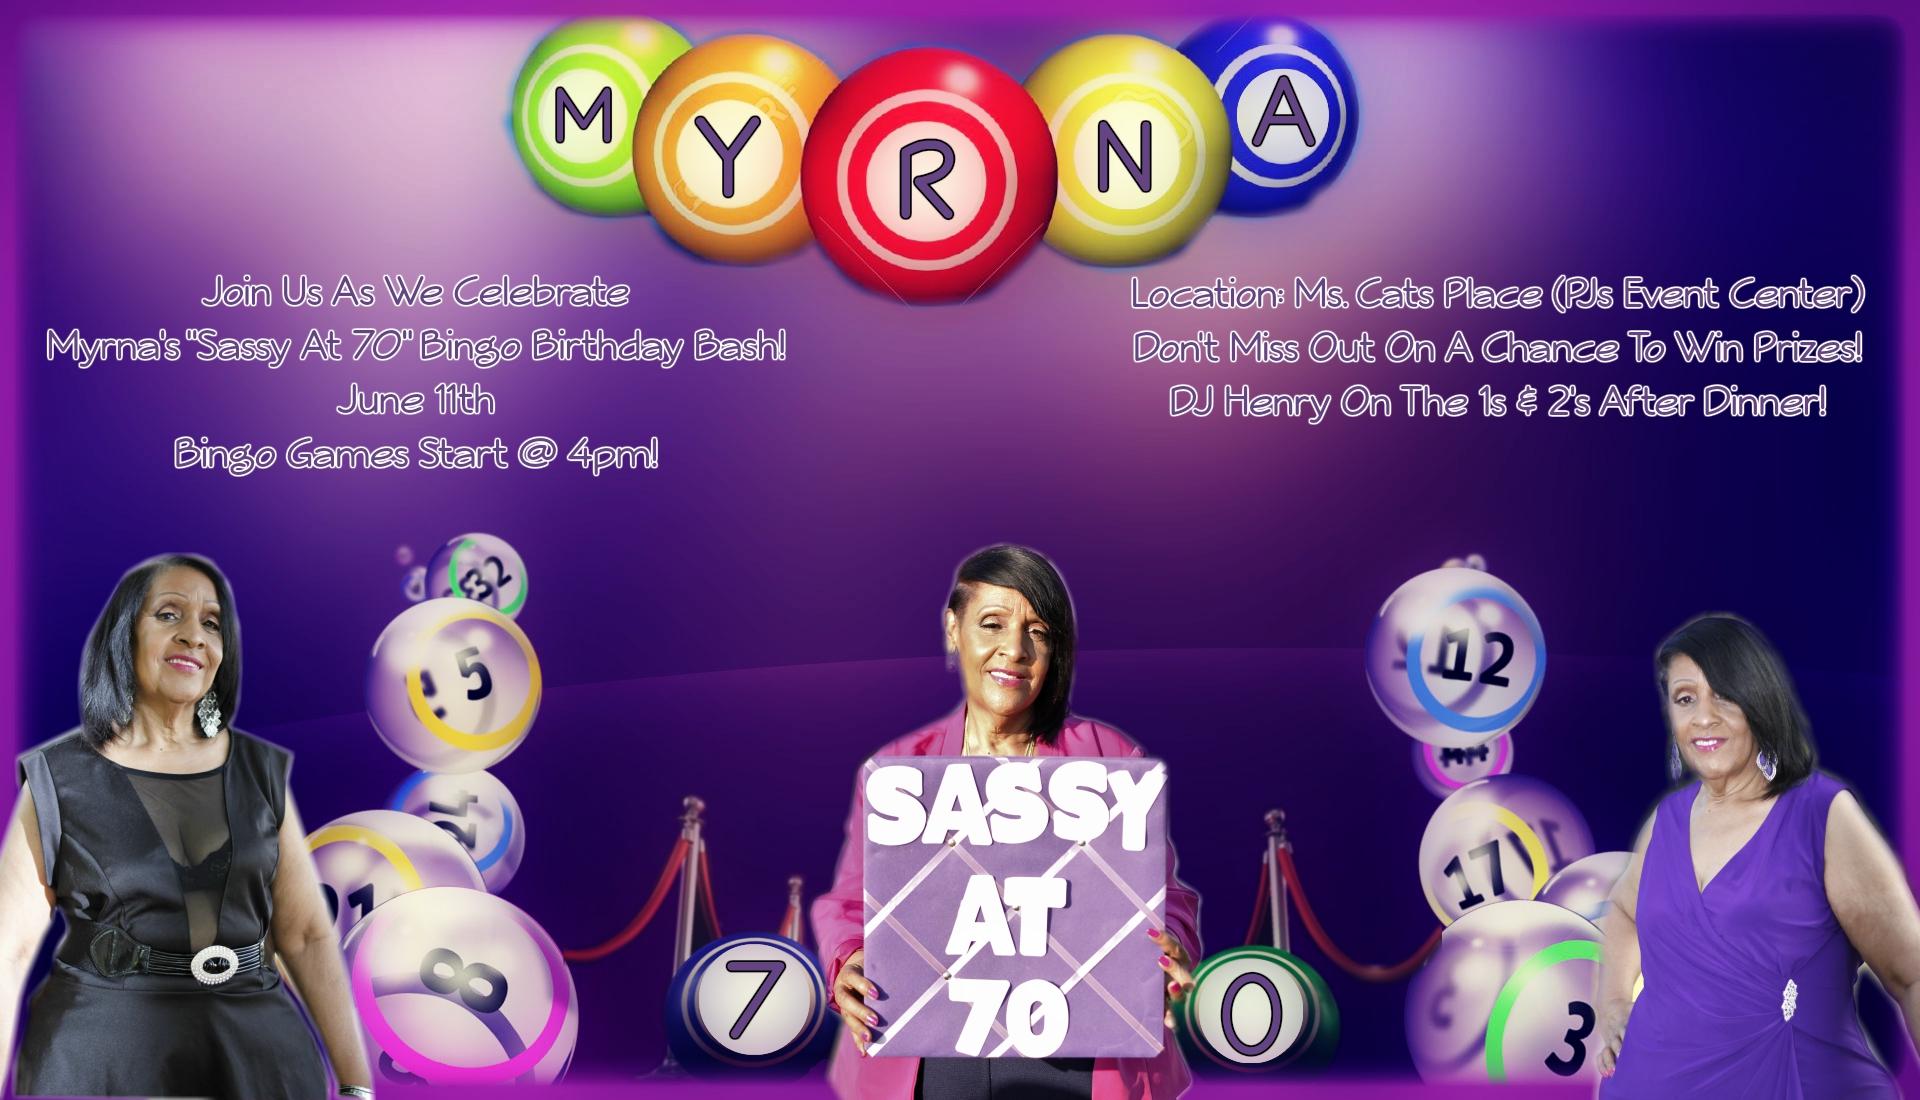 myrna bingo